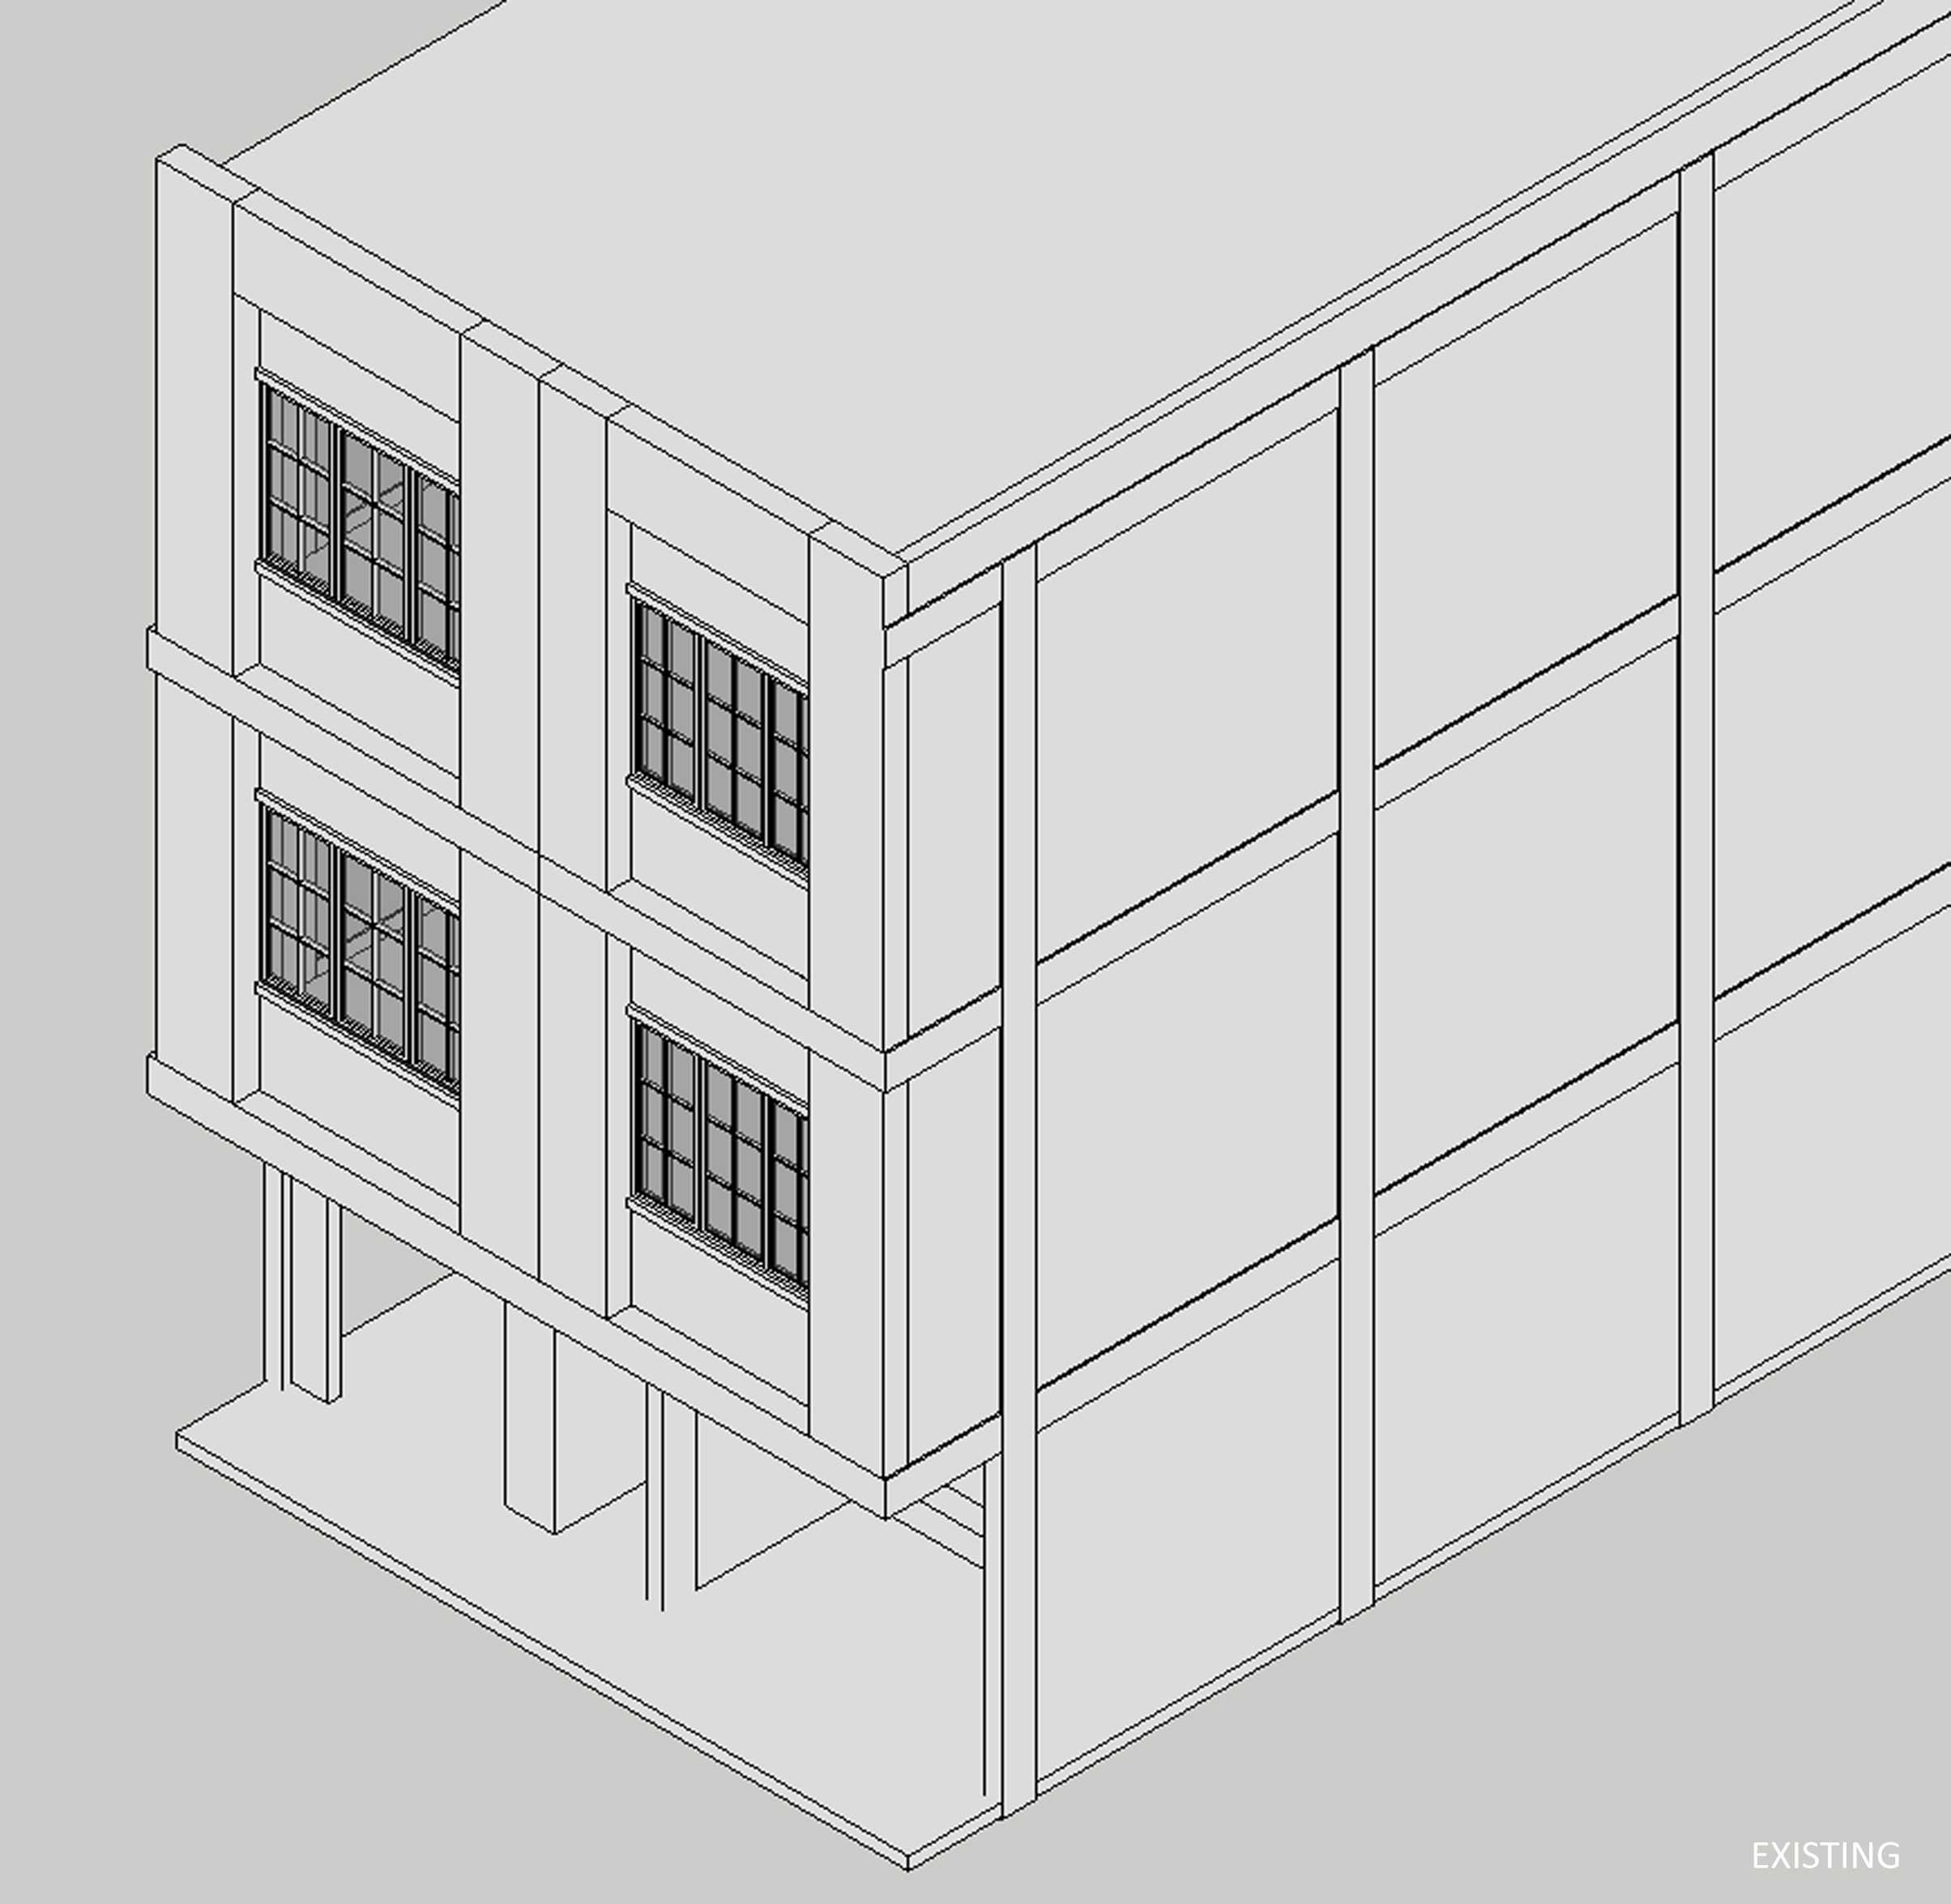 Warnerin Design Office Cafein Pekanbaru, Pekanbaru City, Riau, Indonesia Pekanbaru, Pekanbaru City, Riau, Indonesia As   35817